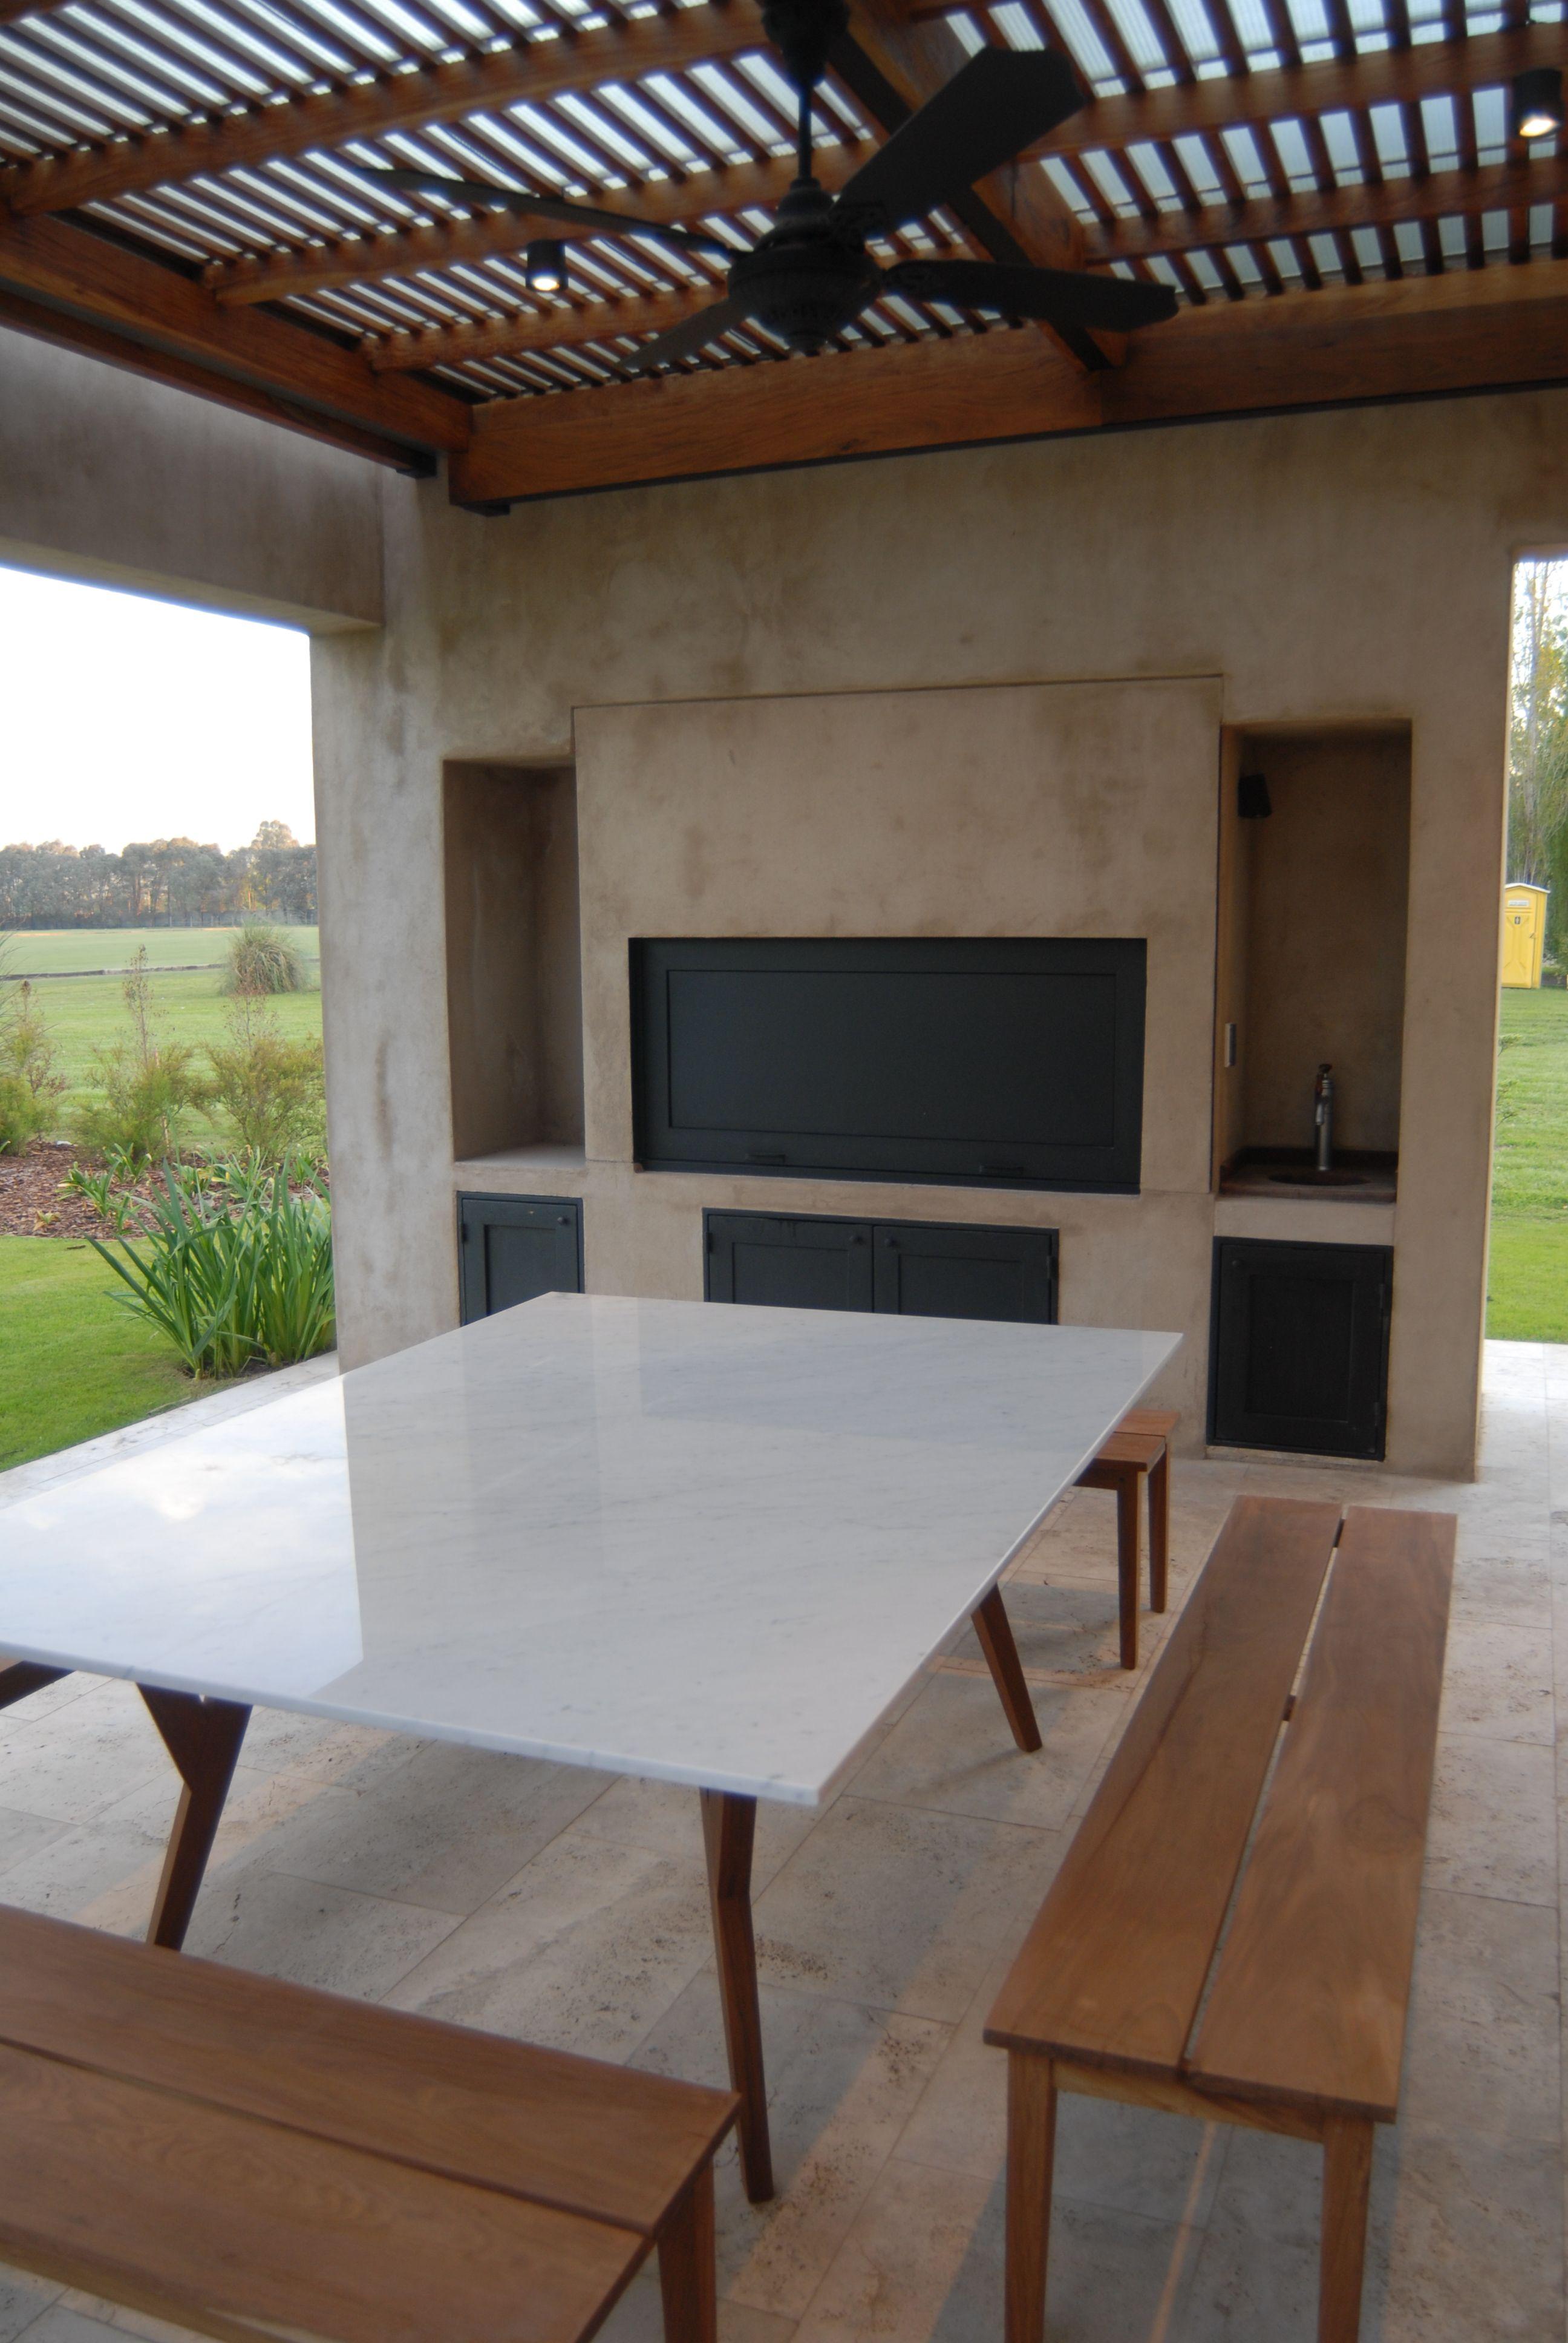 Arquitectura paisajismo ricardo pereyra iraola for Patios y terrazas disenos